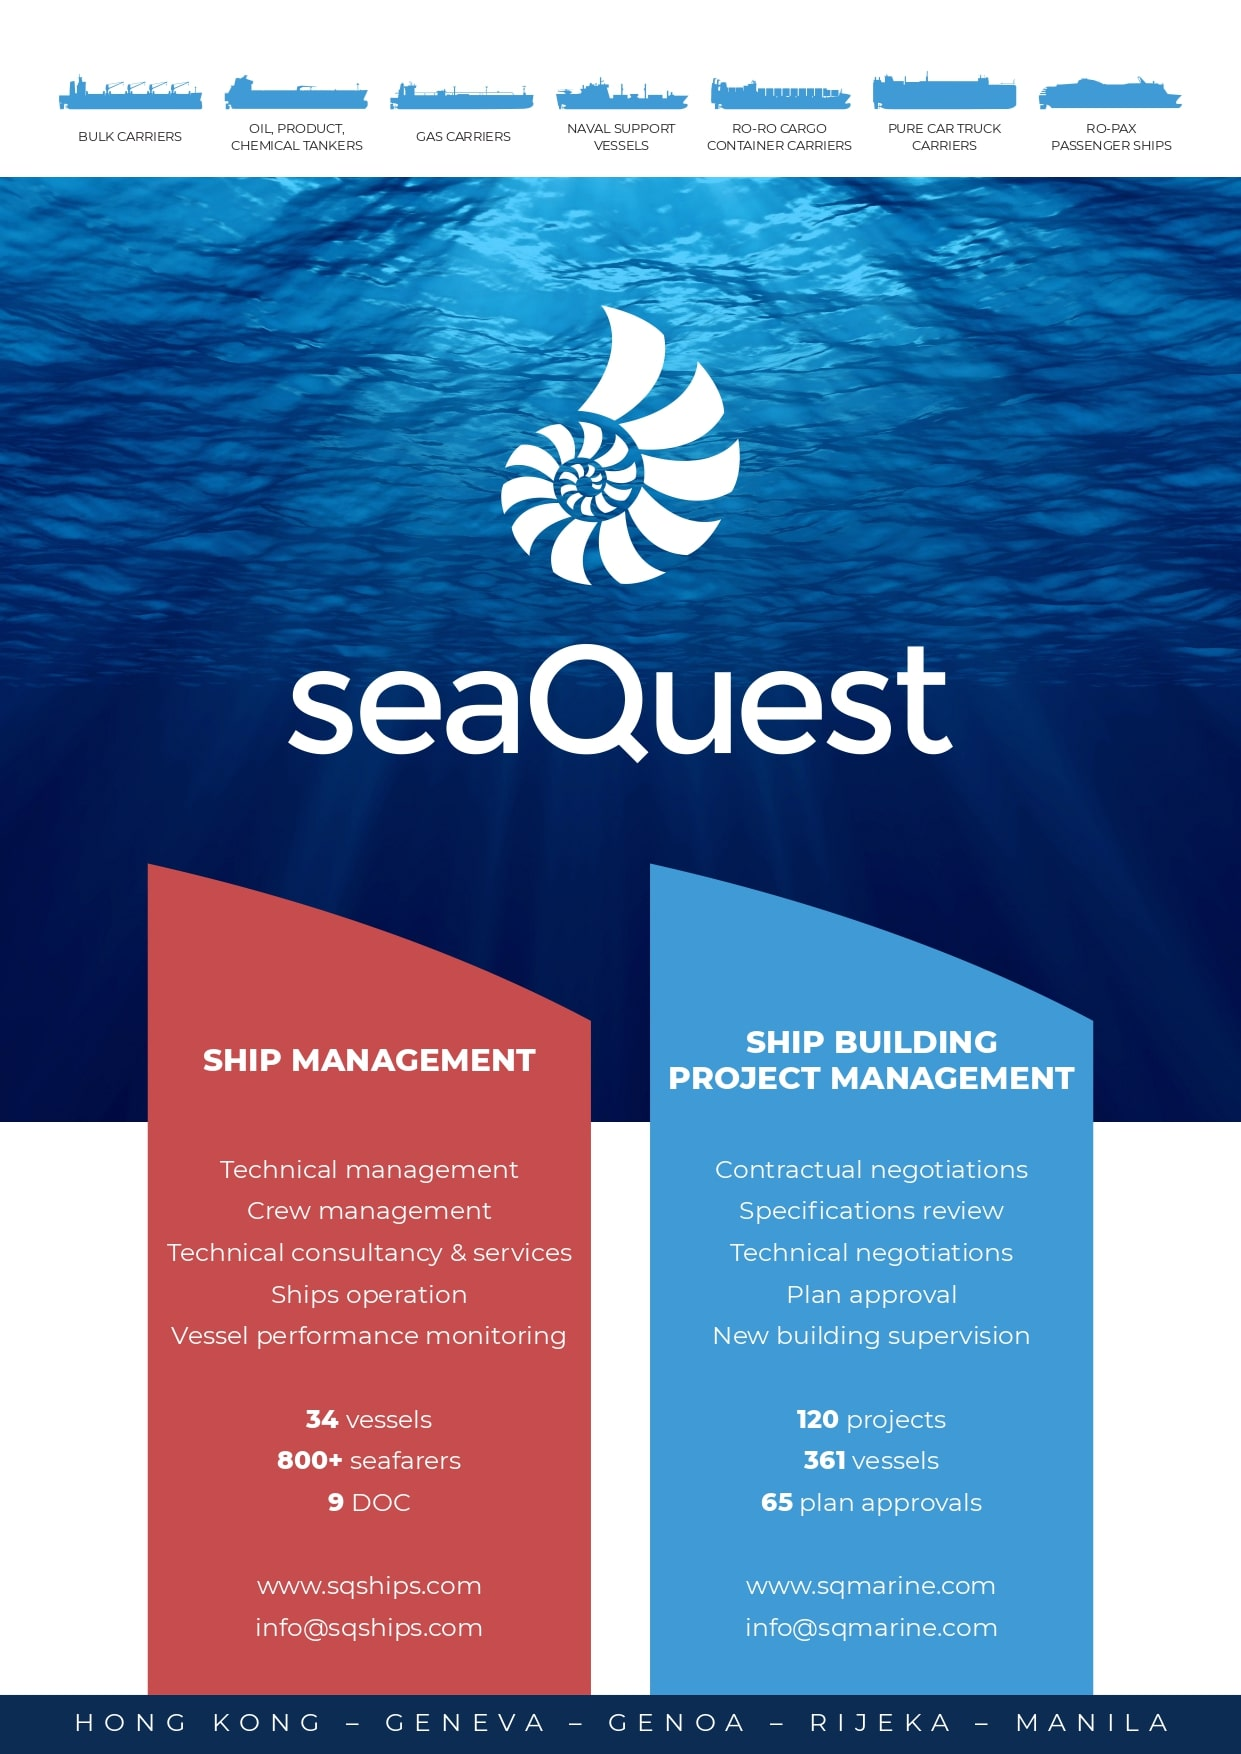 progettazione-comunicazione-marittima-seaquest-hong-kong